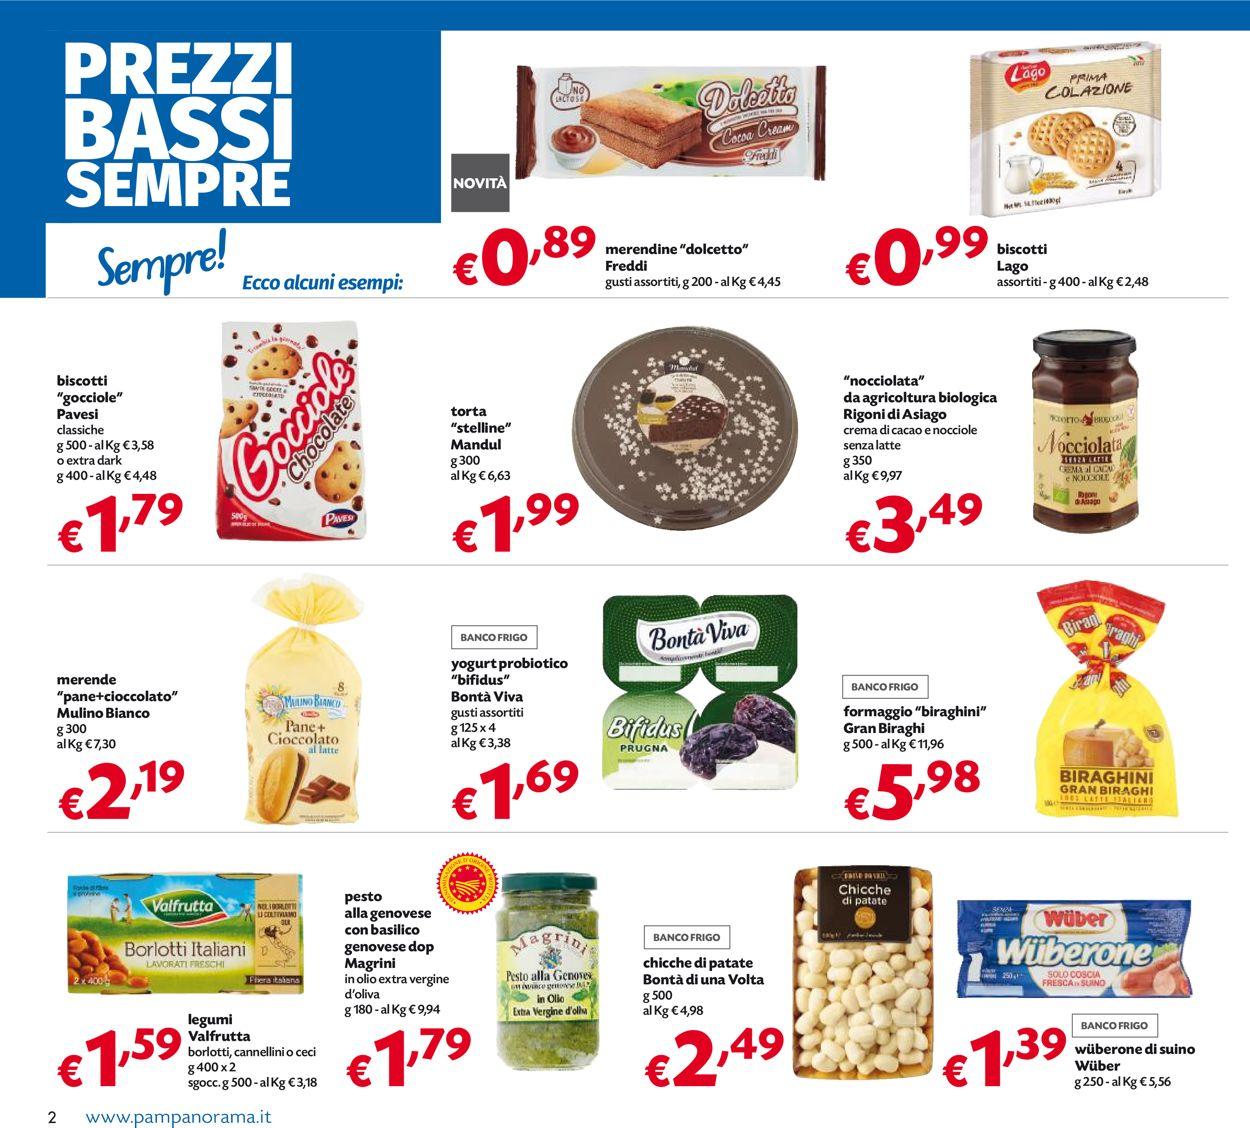 Volantino Pam Panorama - Offerte 17/09-27/09/2020 (Pagina 2)